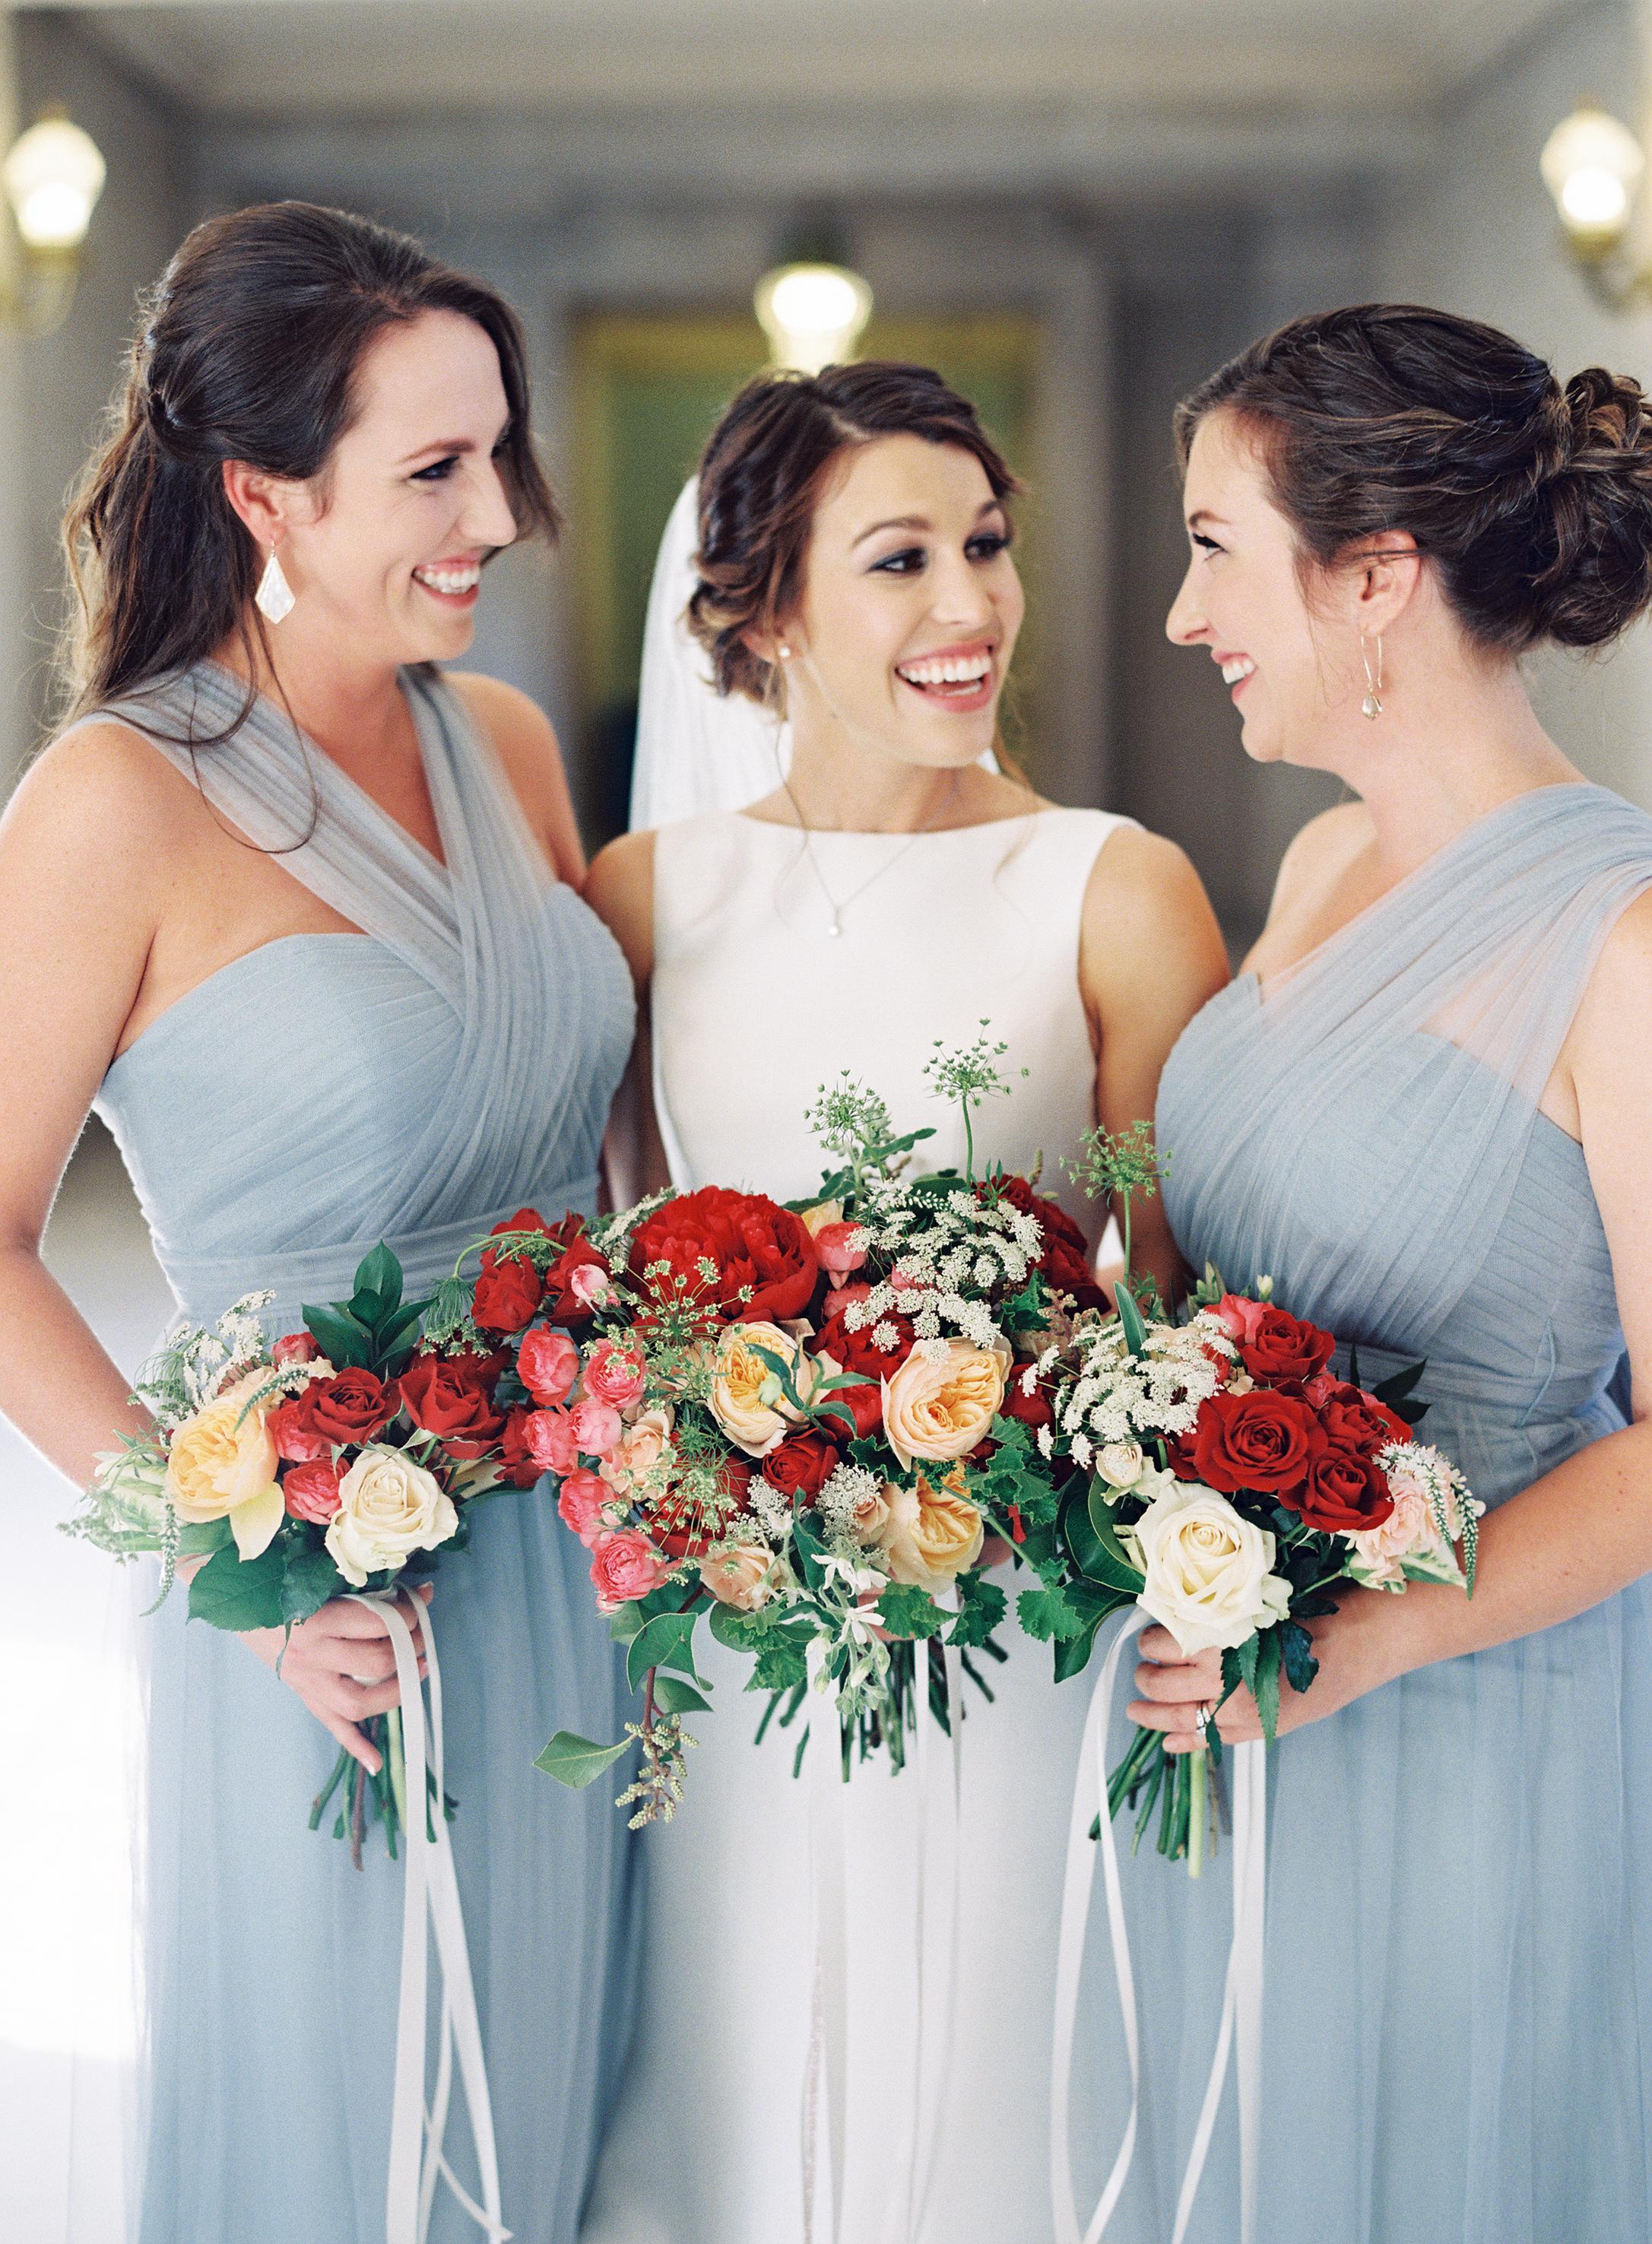 Meghan Mehan Photography - California Wedding Photographer | San Francisco City Hall Wedding 064.jpg